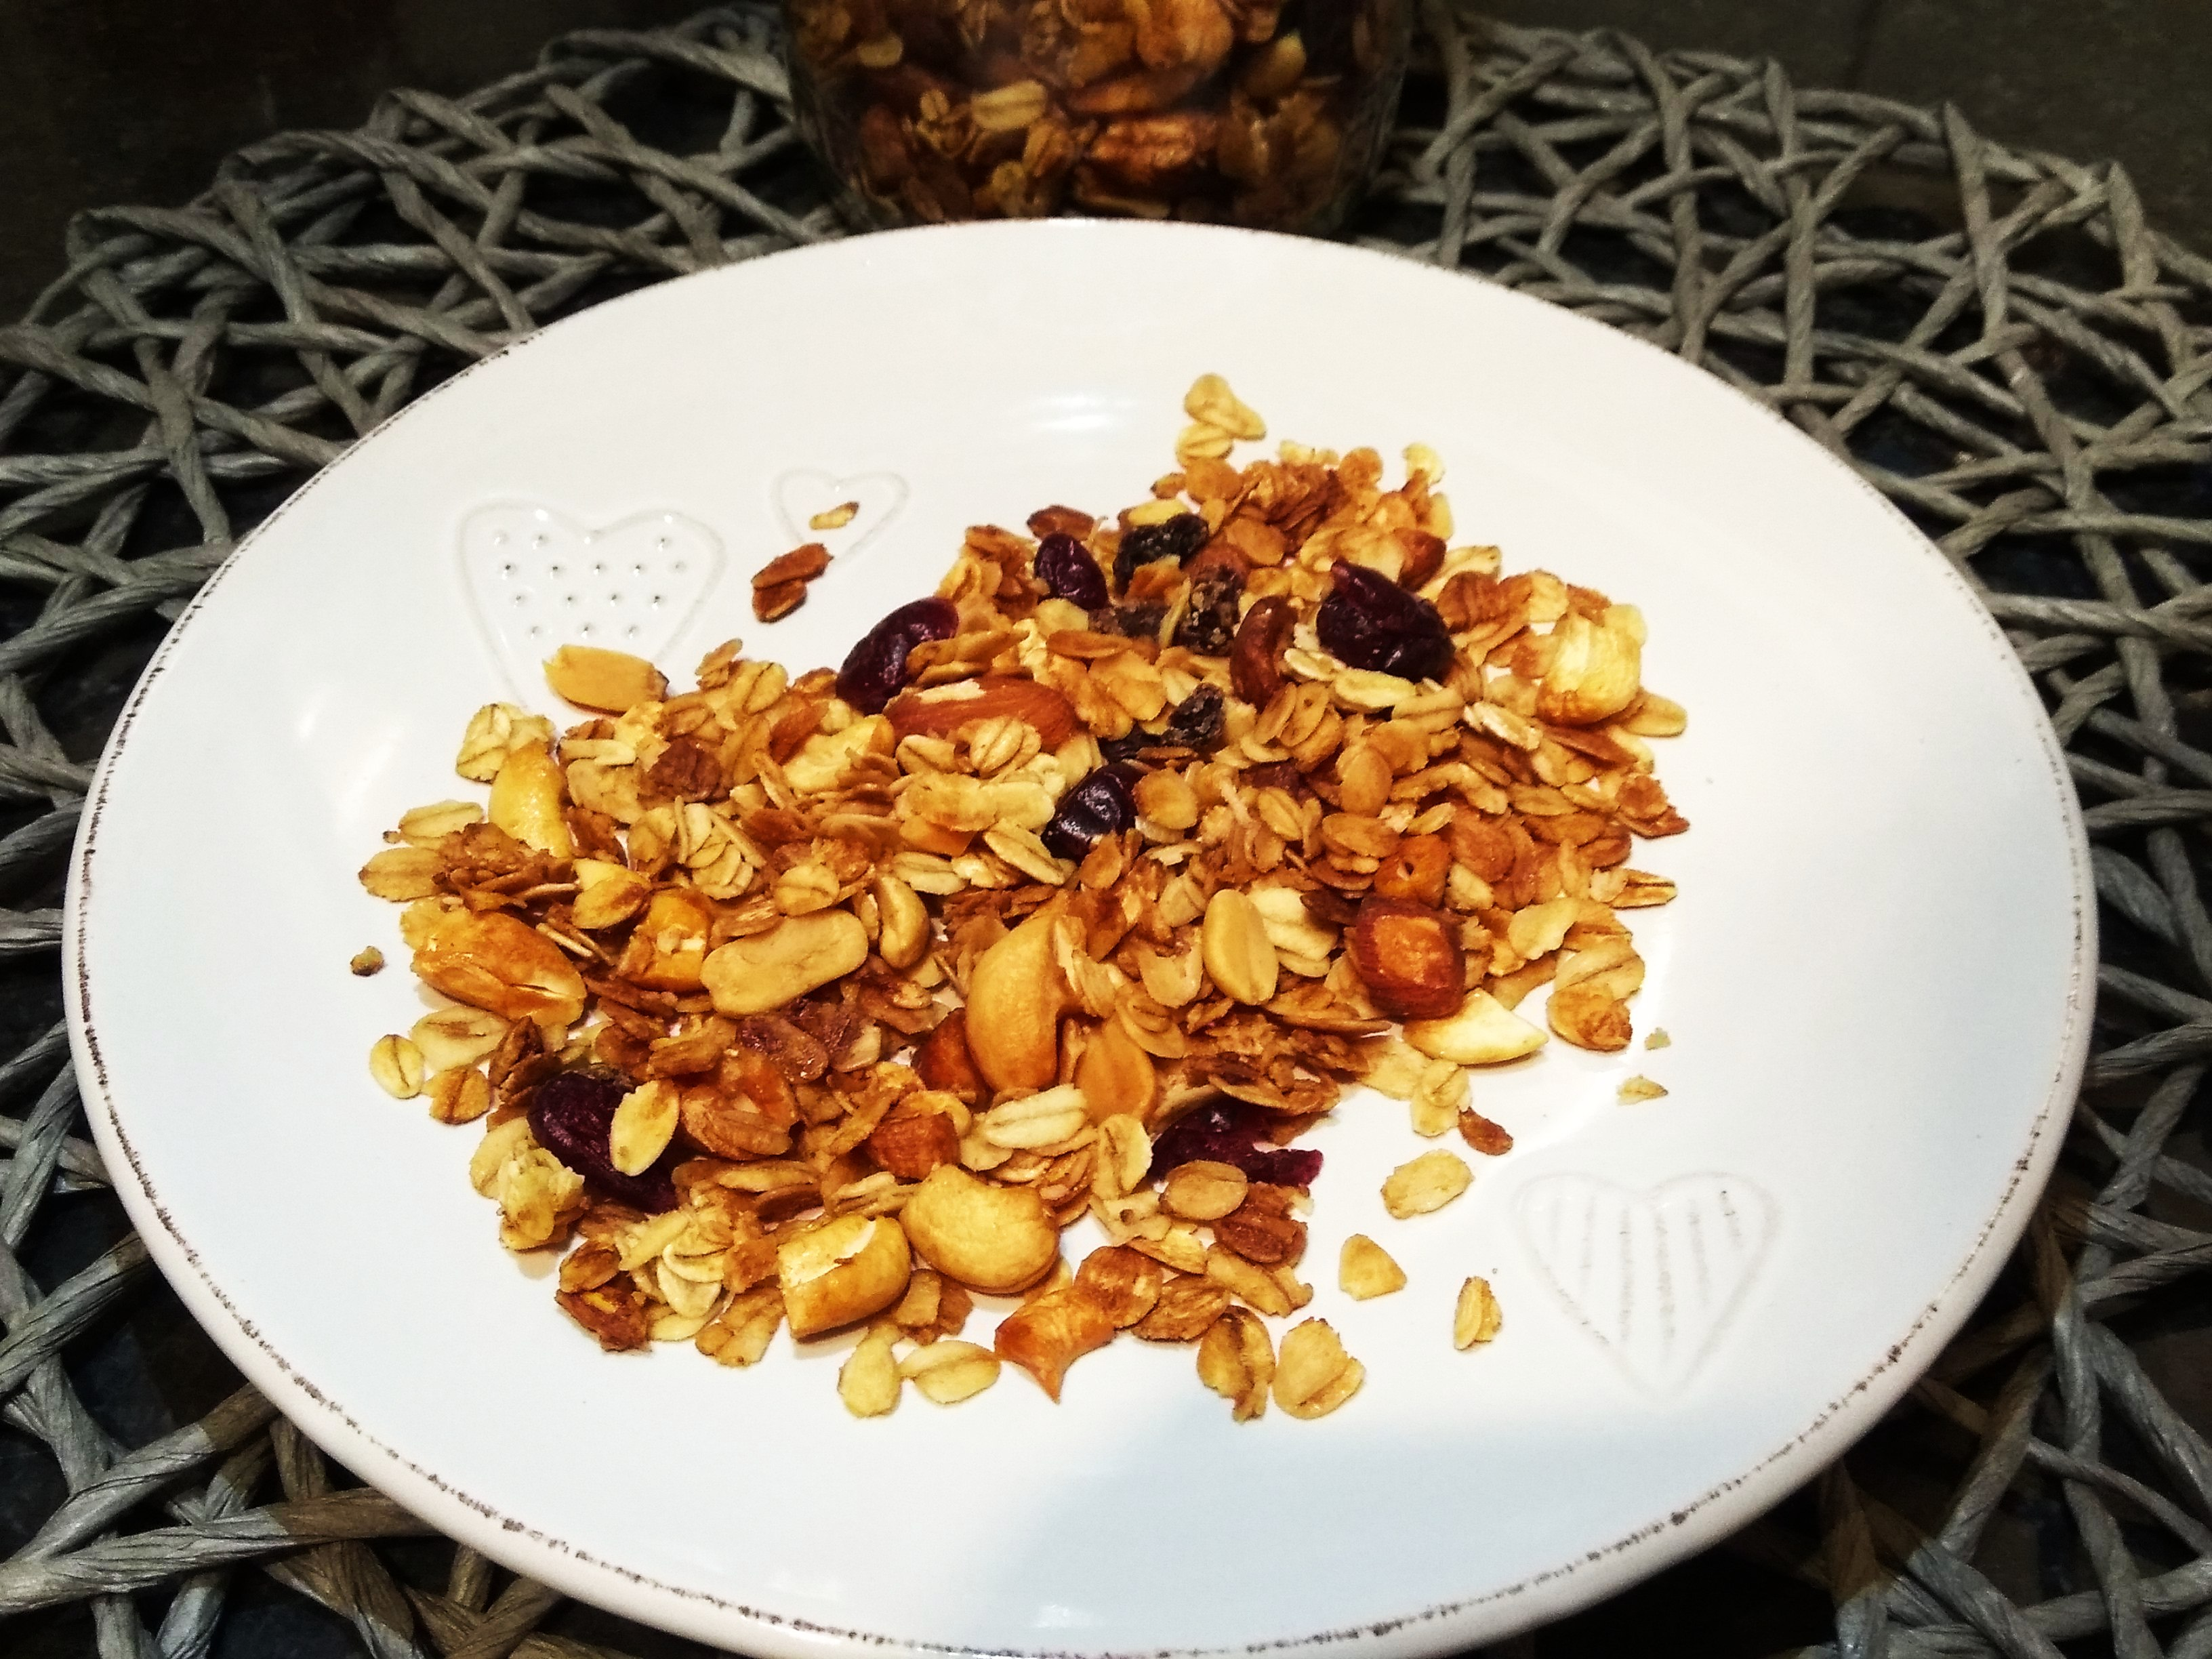 Gluténmentes granola- ezzel dobd fel a reggelid!